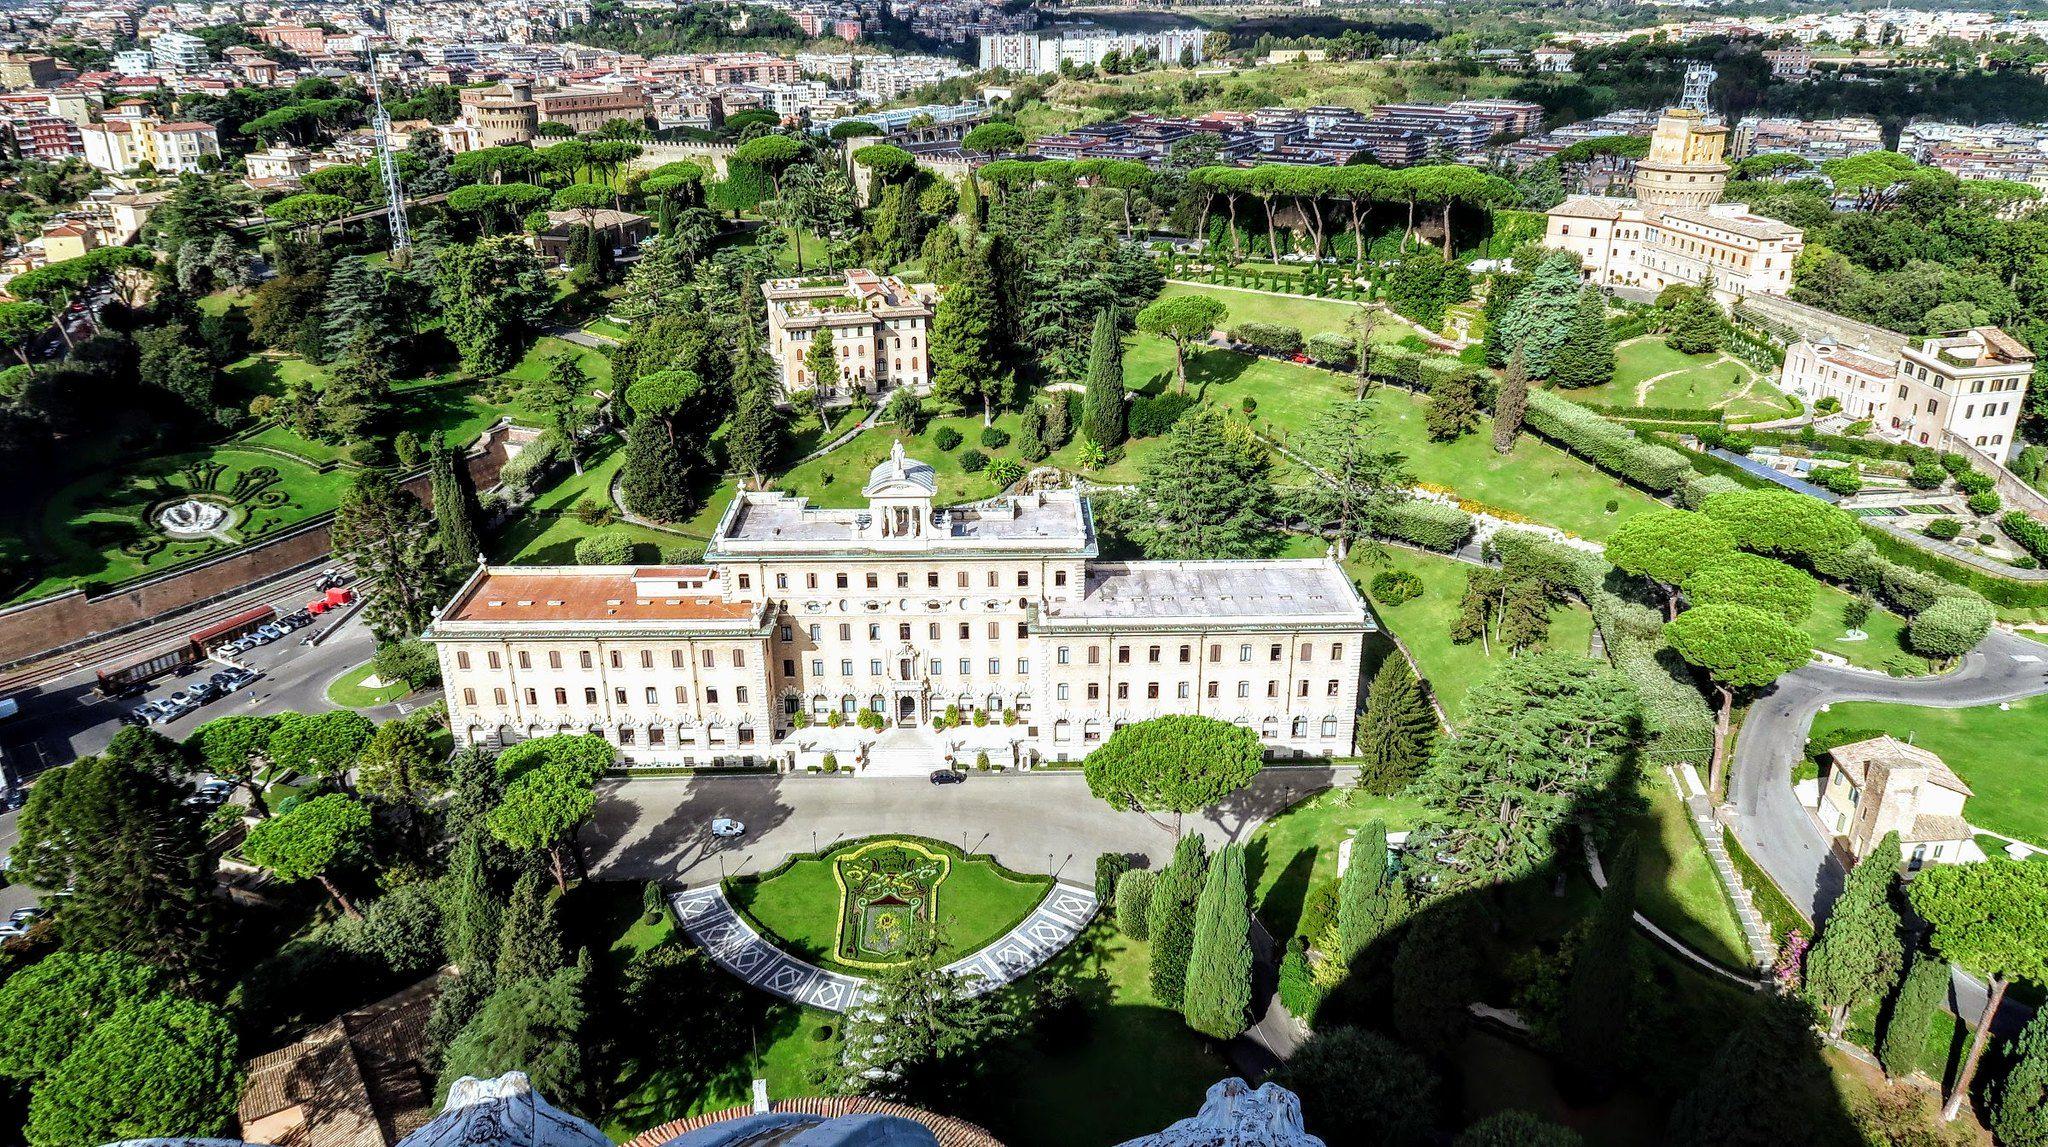 50d0894522190154f94f441417de7715 - Vatican Gardens And Vatican Museums Tour